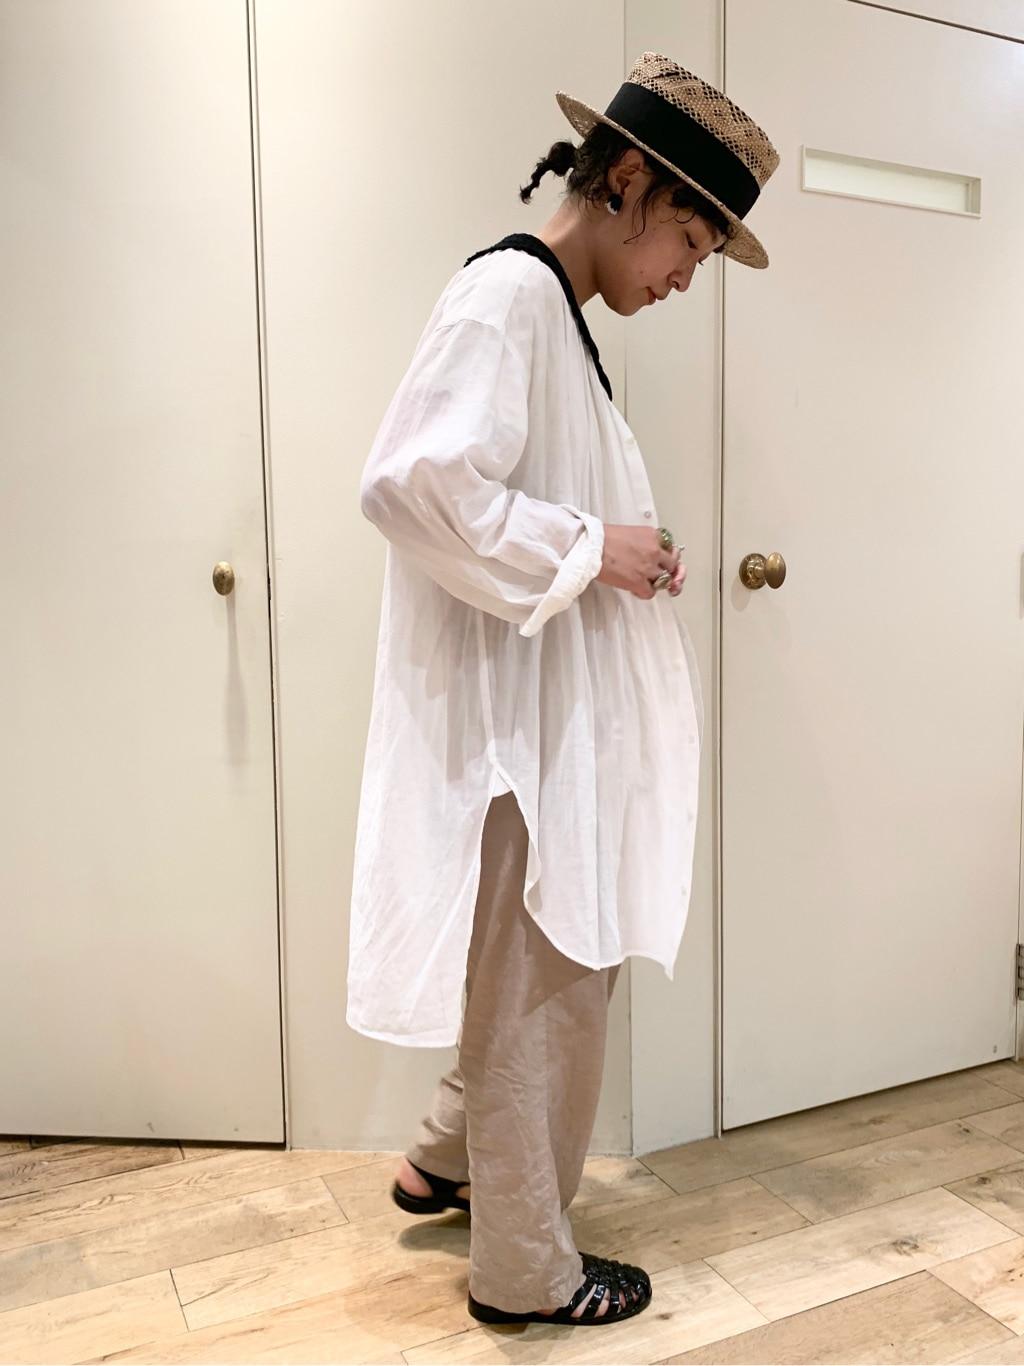 bulle de savon 新宿ミロード 身長:159cm 2020.08.04